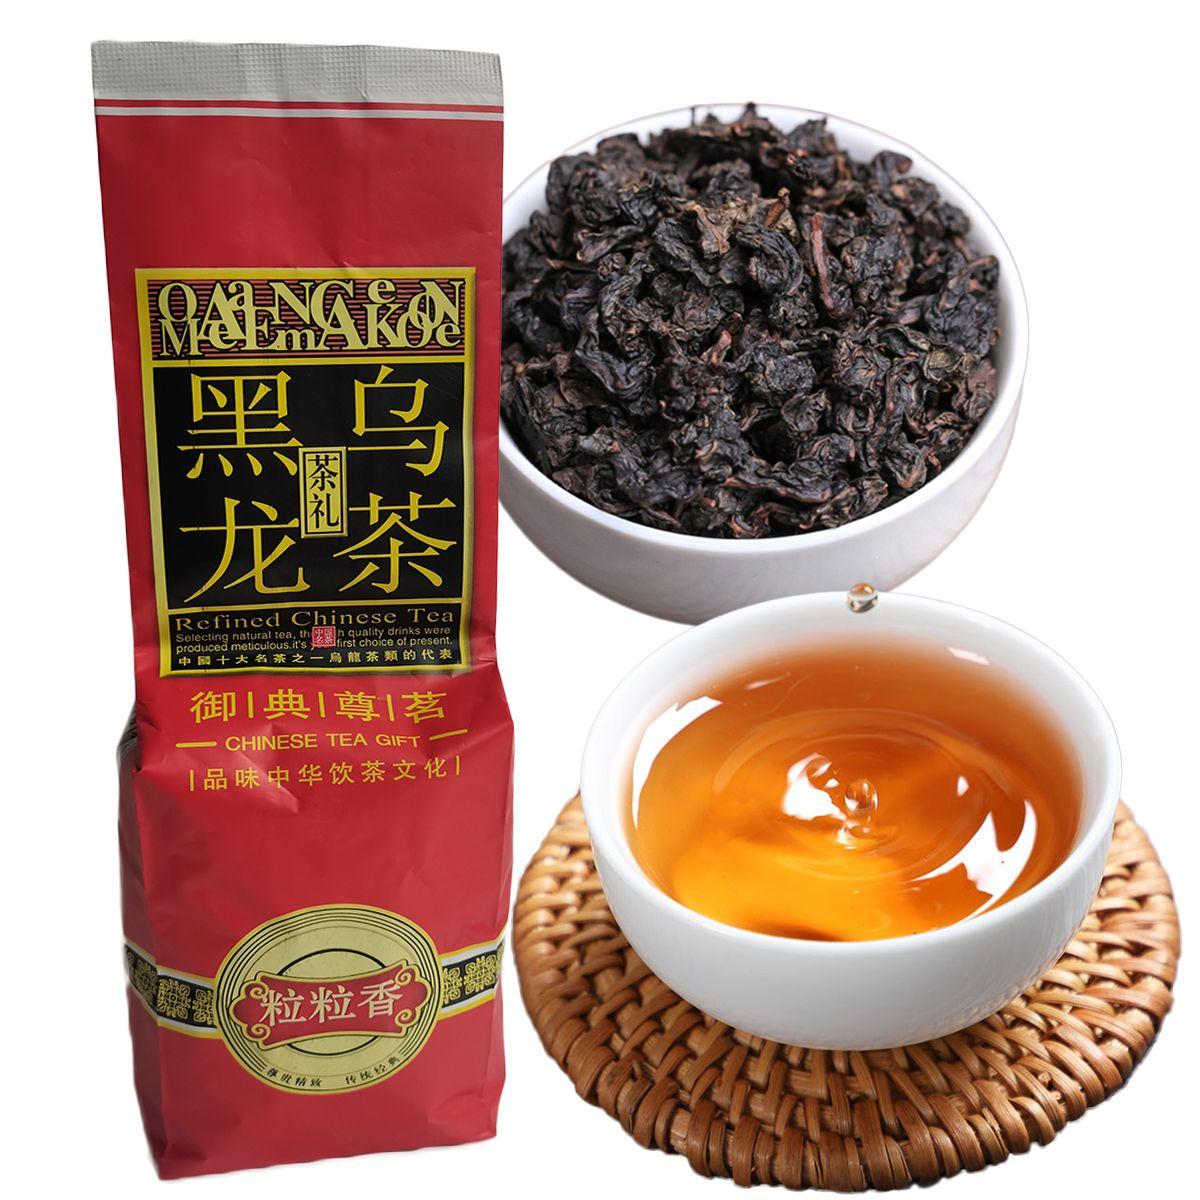 Tercih Edilen 250g Çin Organik Oolong Çay Siyah Tieguanyin Oolong Yeşil Çay Sağlık Yeni Bahar Çay Yeşil Gıda Vakumlu Ambalaj